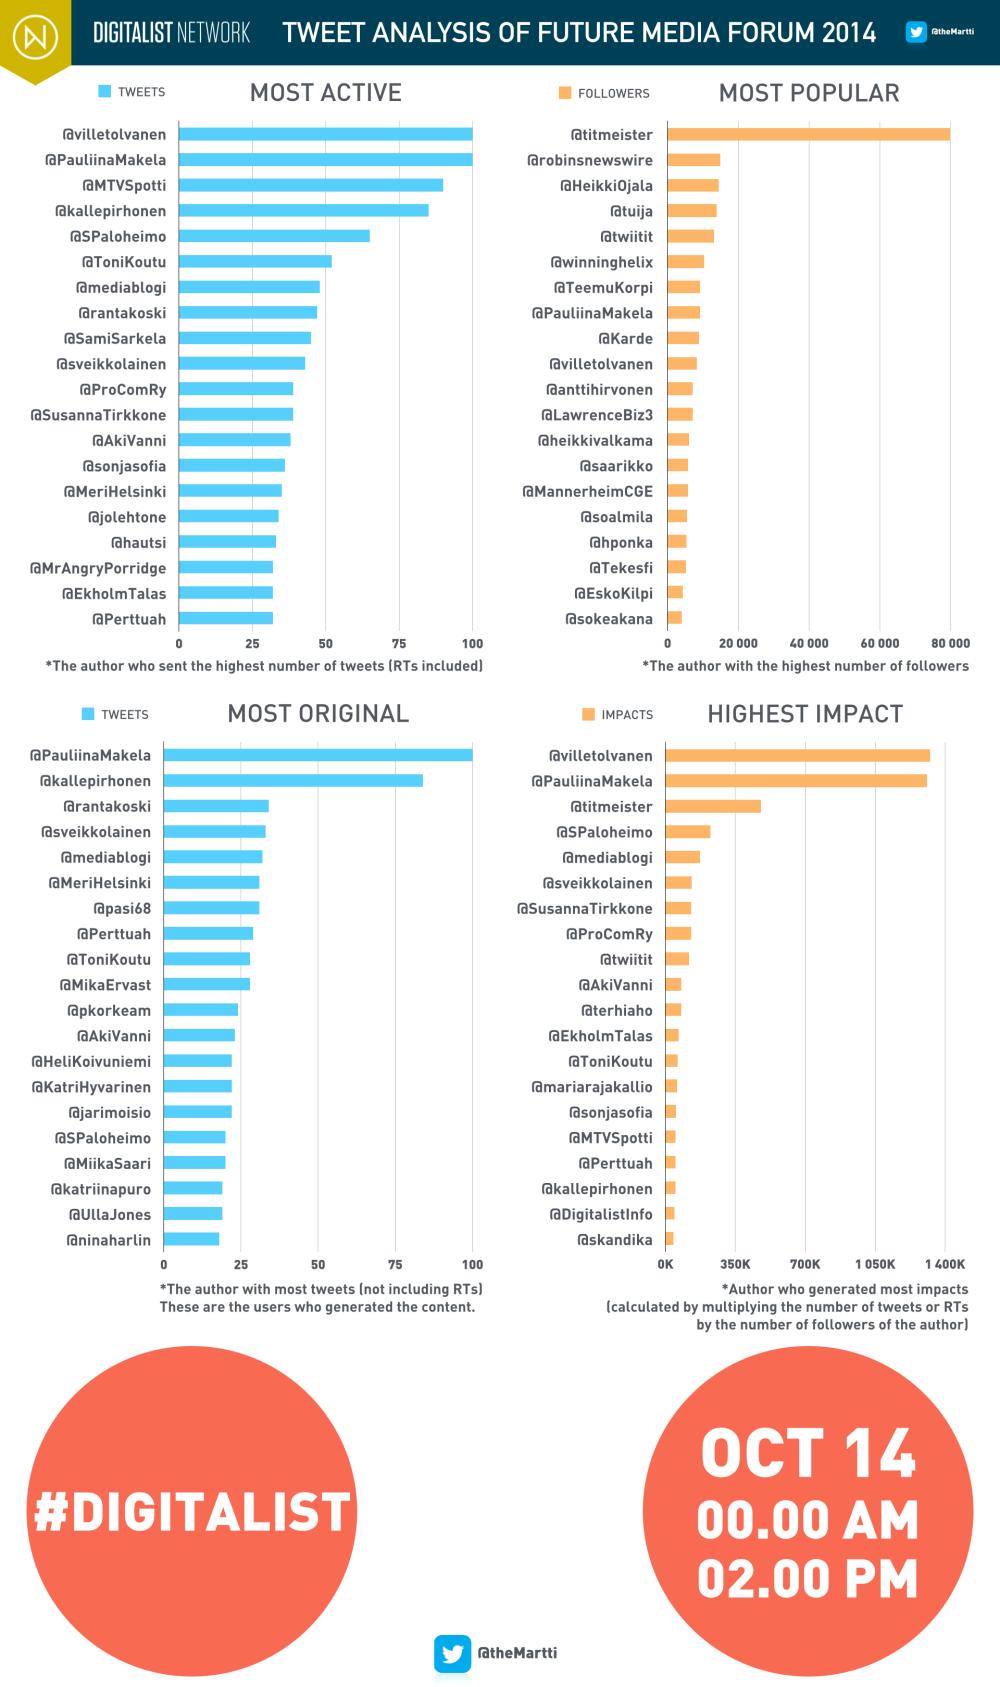 theMartti_Analysis_Digitalist_Media Future_003